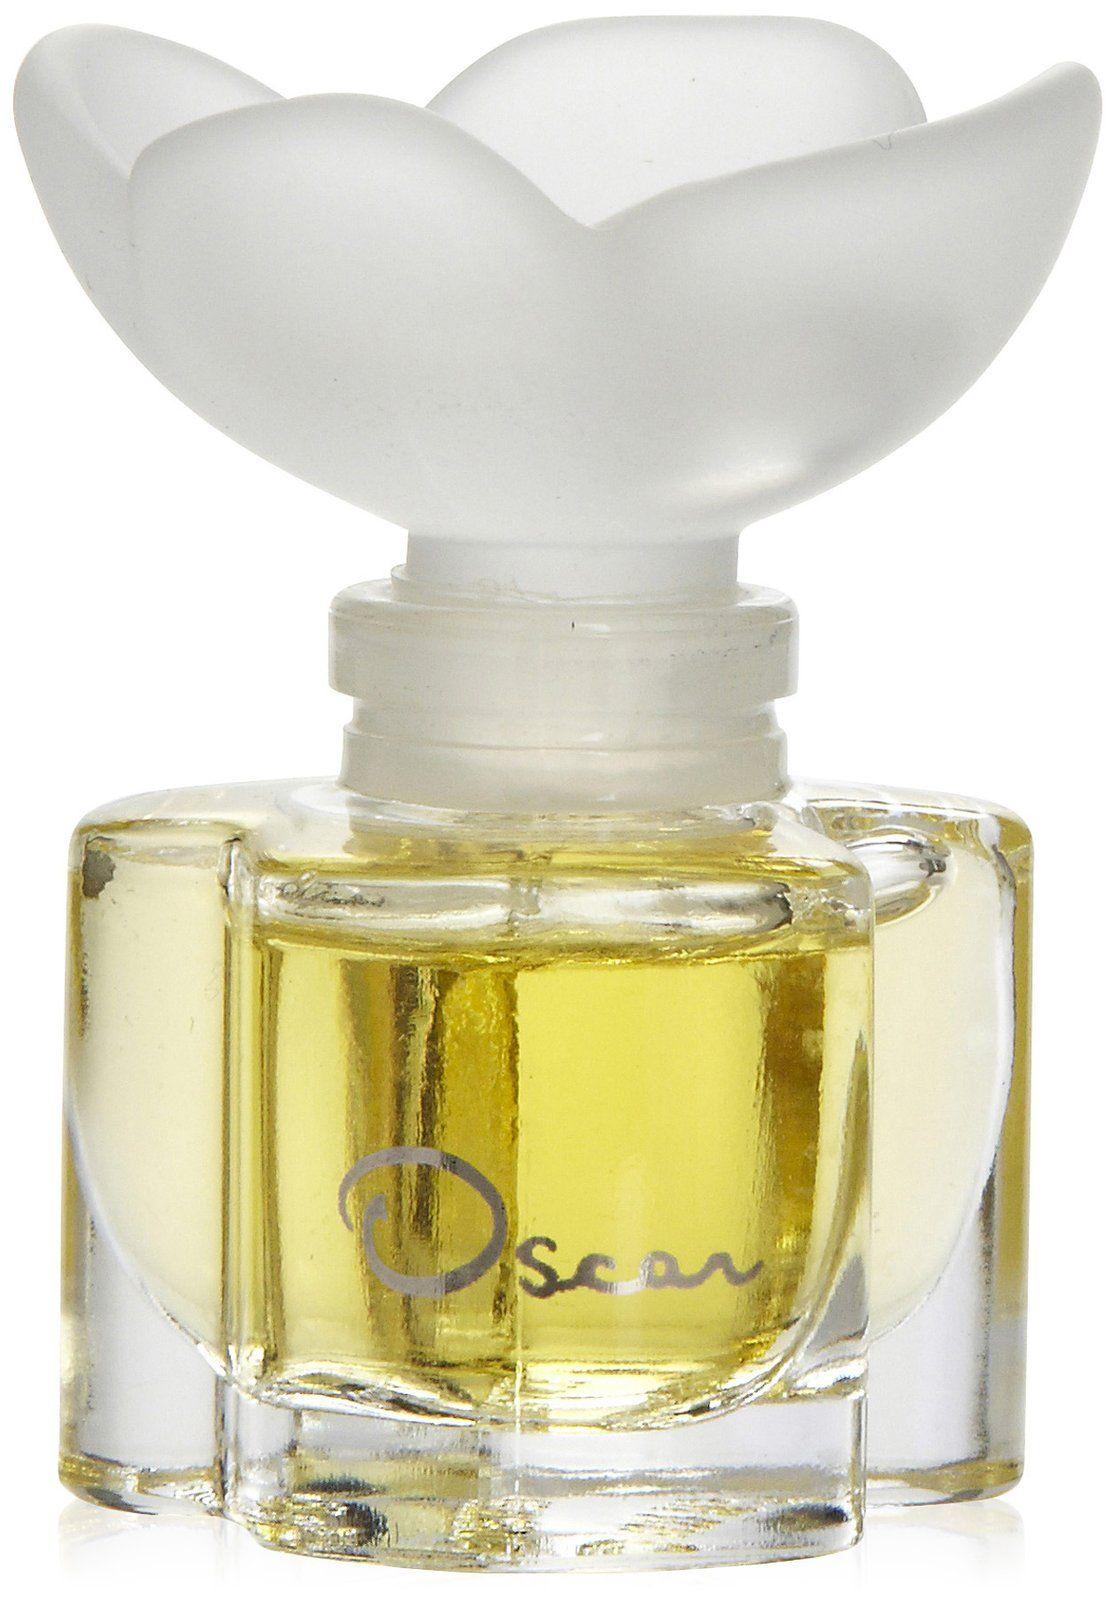 Oscar De La Renta Oscar Parfum Products I Love Perfume Bottles